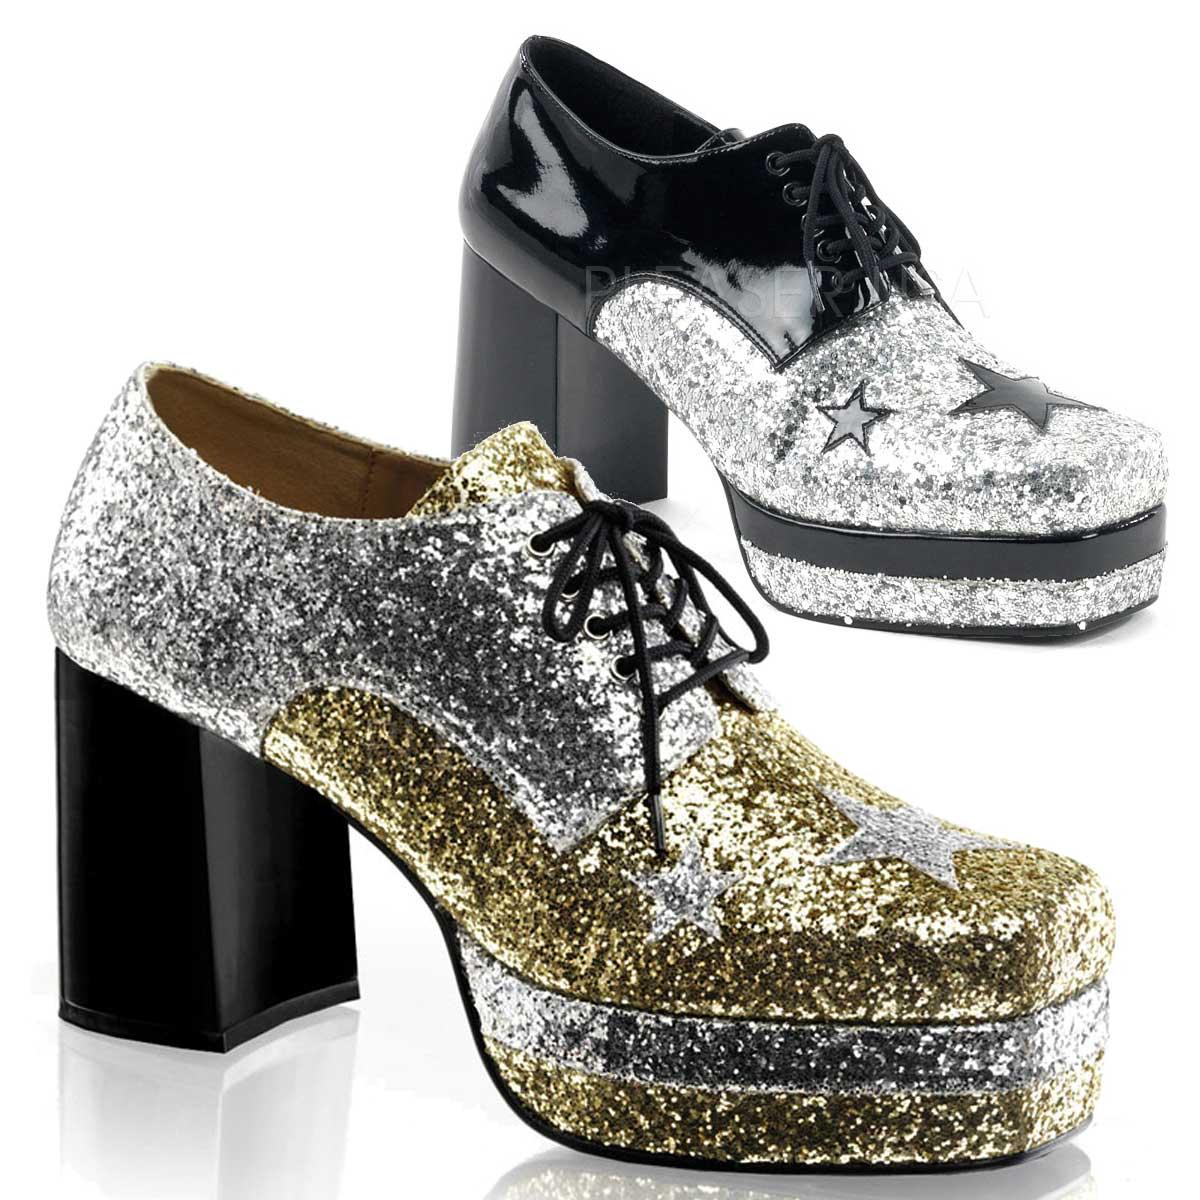 e14b9fac5c7e GLAMROCK-02   3.5 Inch Heel Platform Men Glitter Shoe with Stars ...